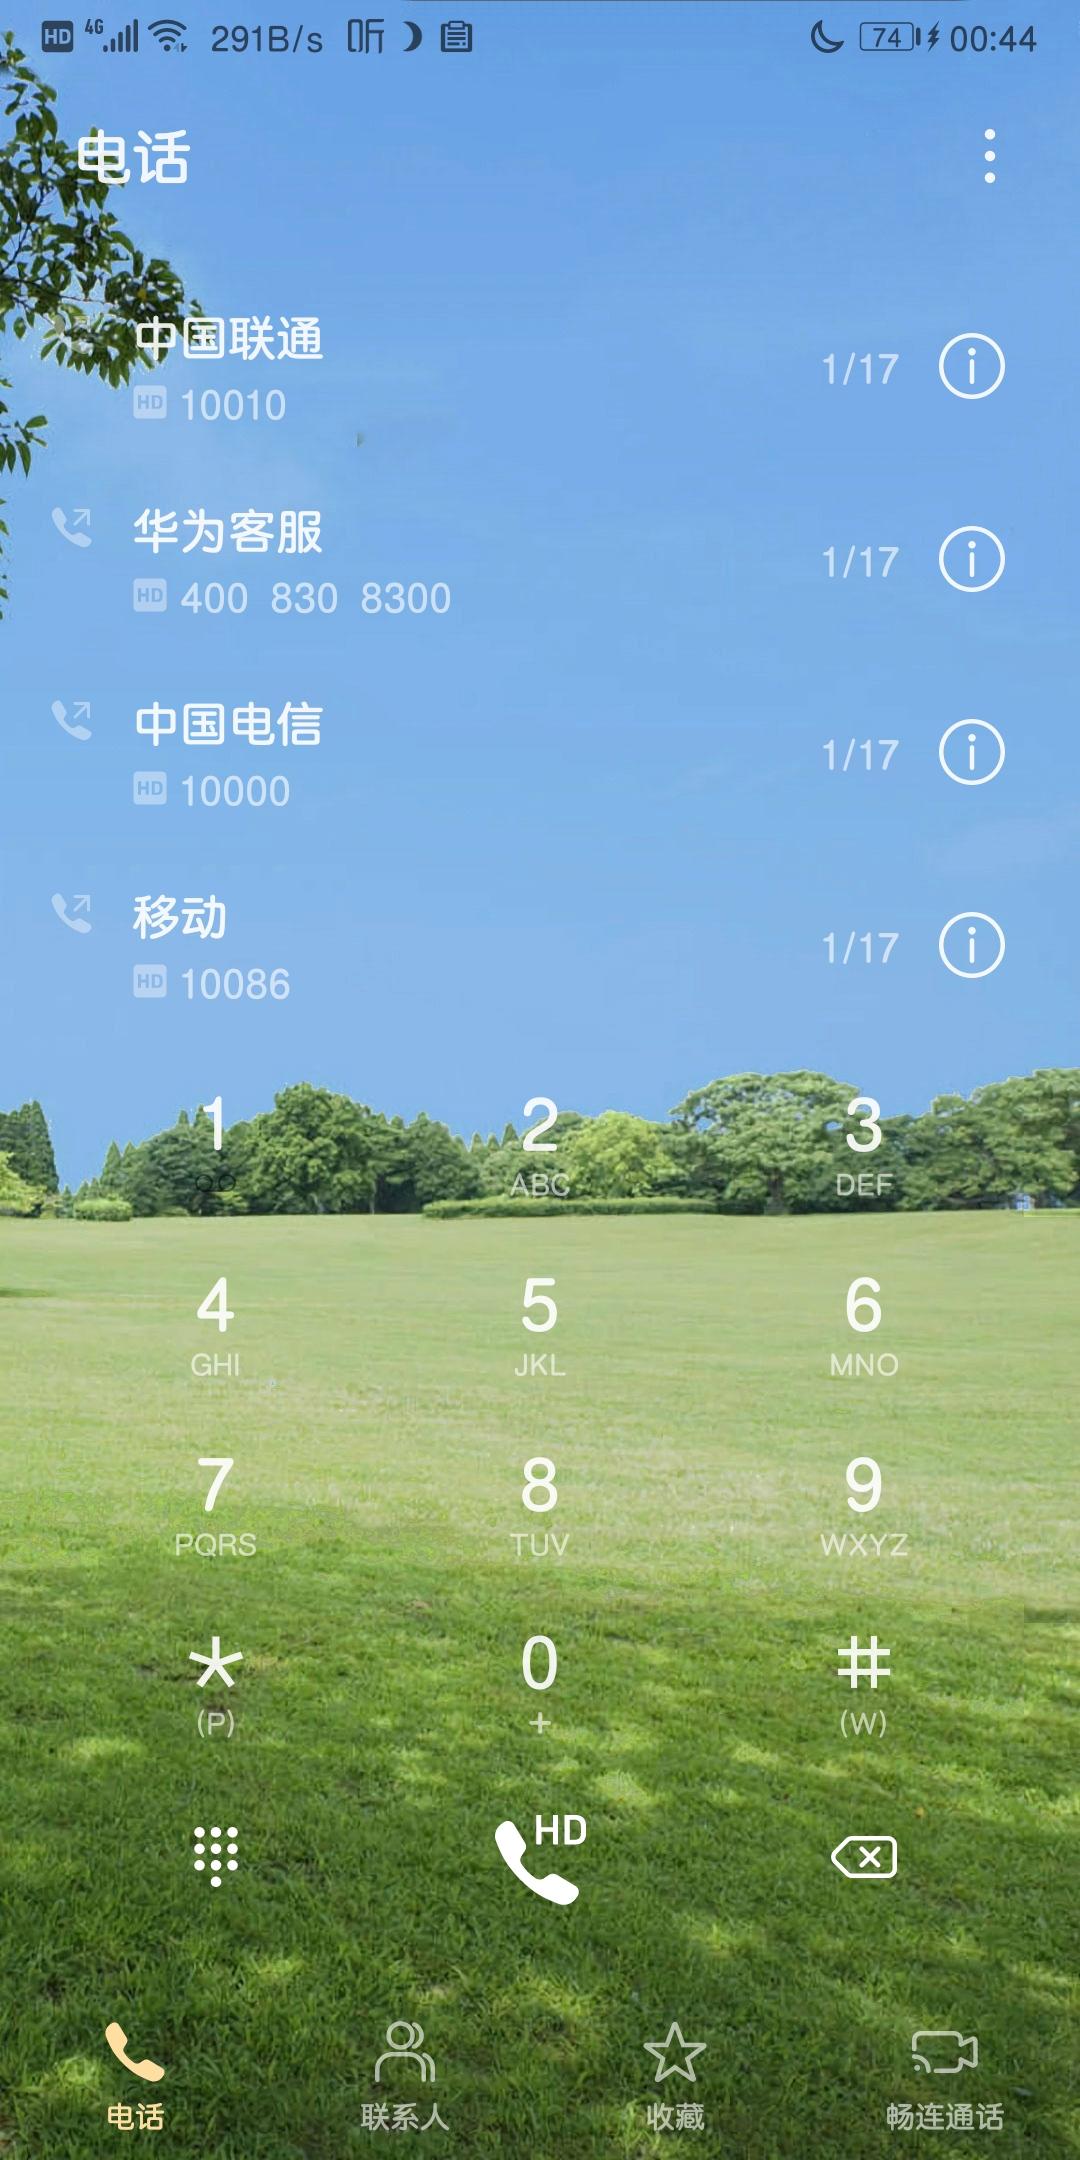 Screenshot_20200202_004457_com.android.contacts.jpg